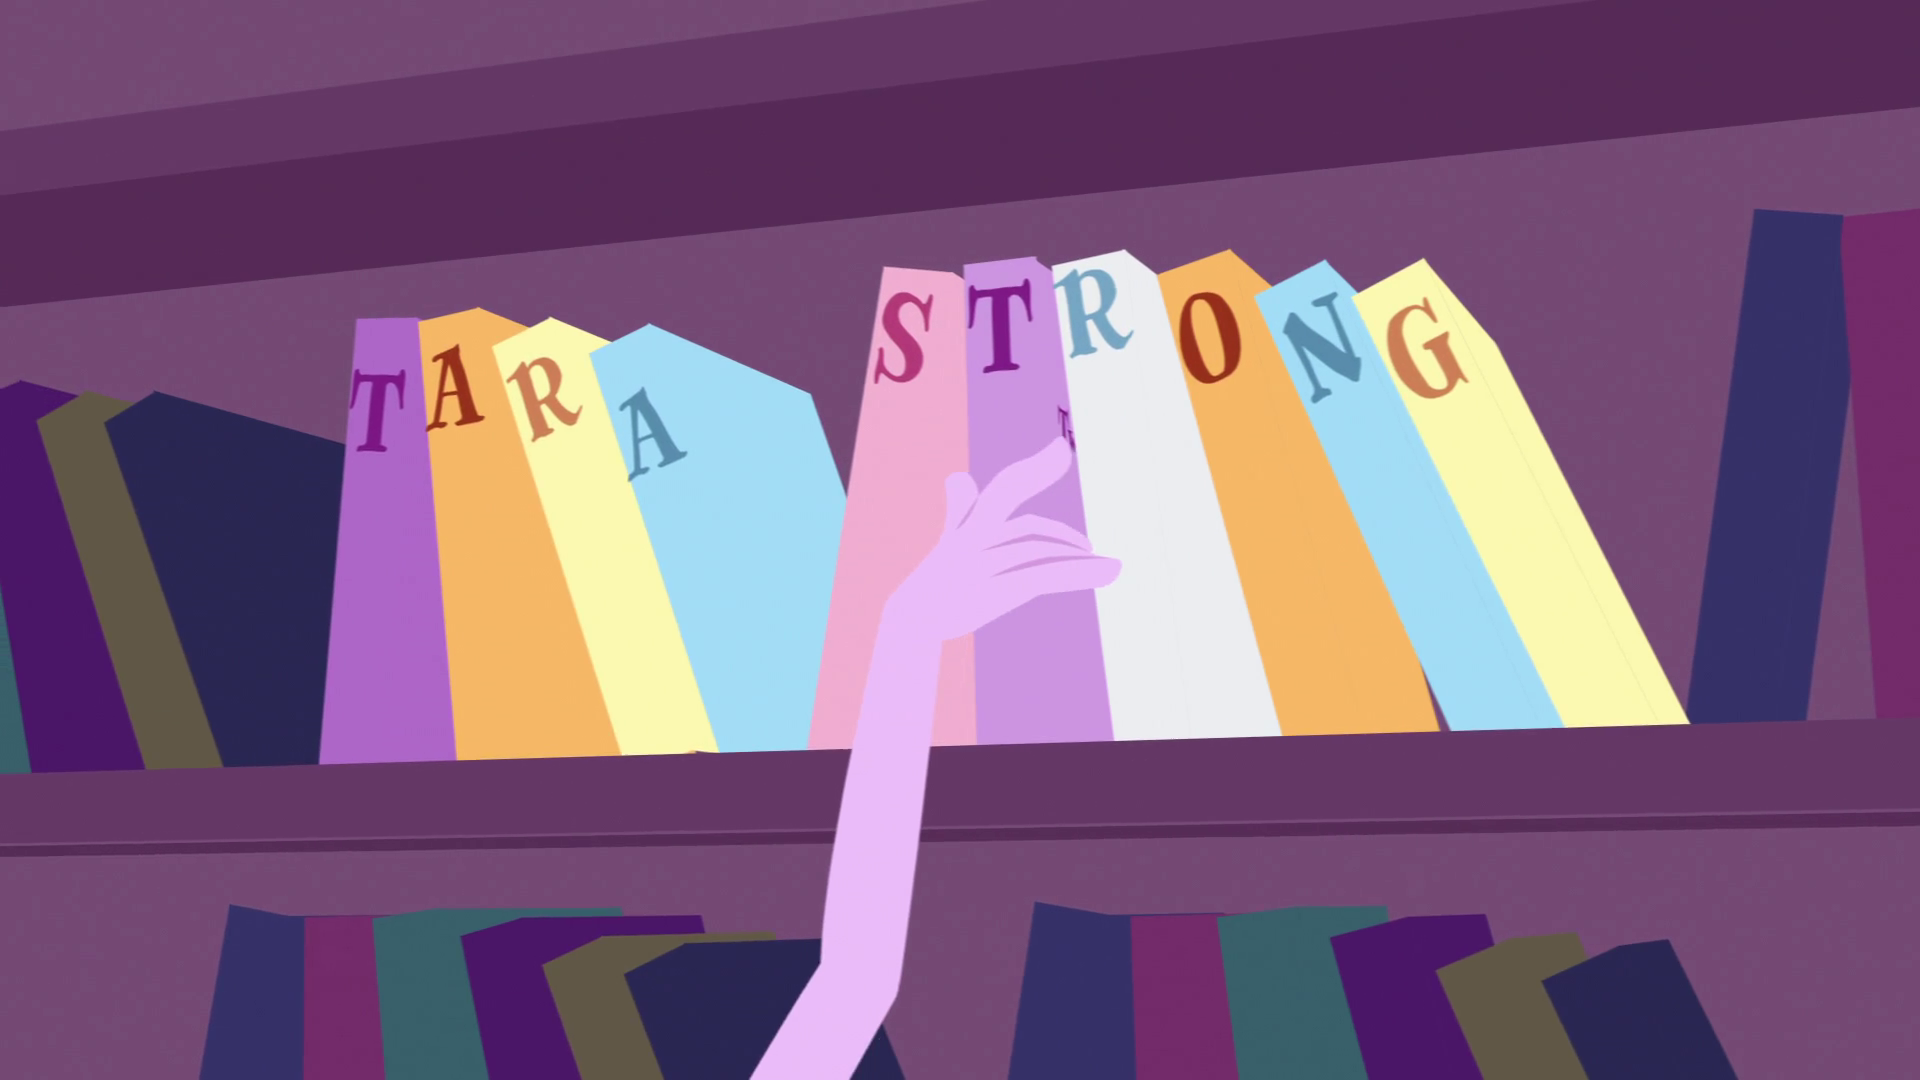 Archivo:Tara Strong credit bookshelf EG opening.png